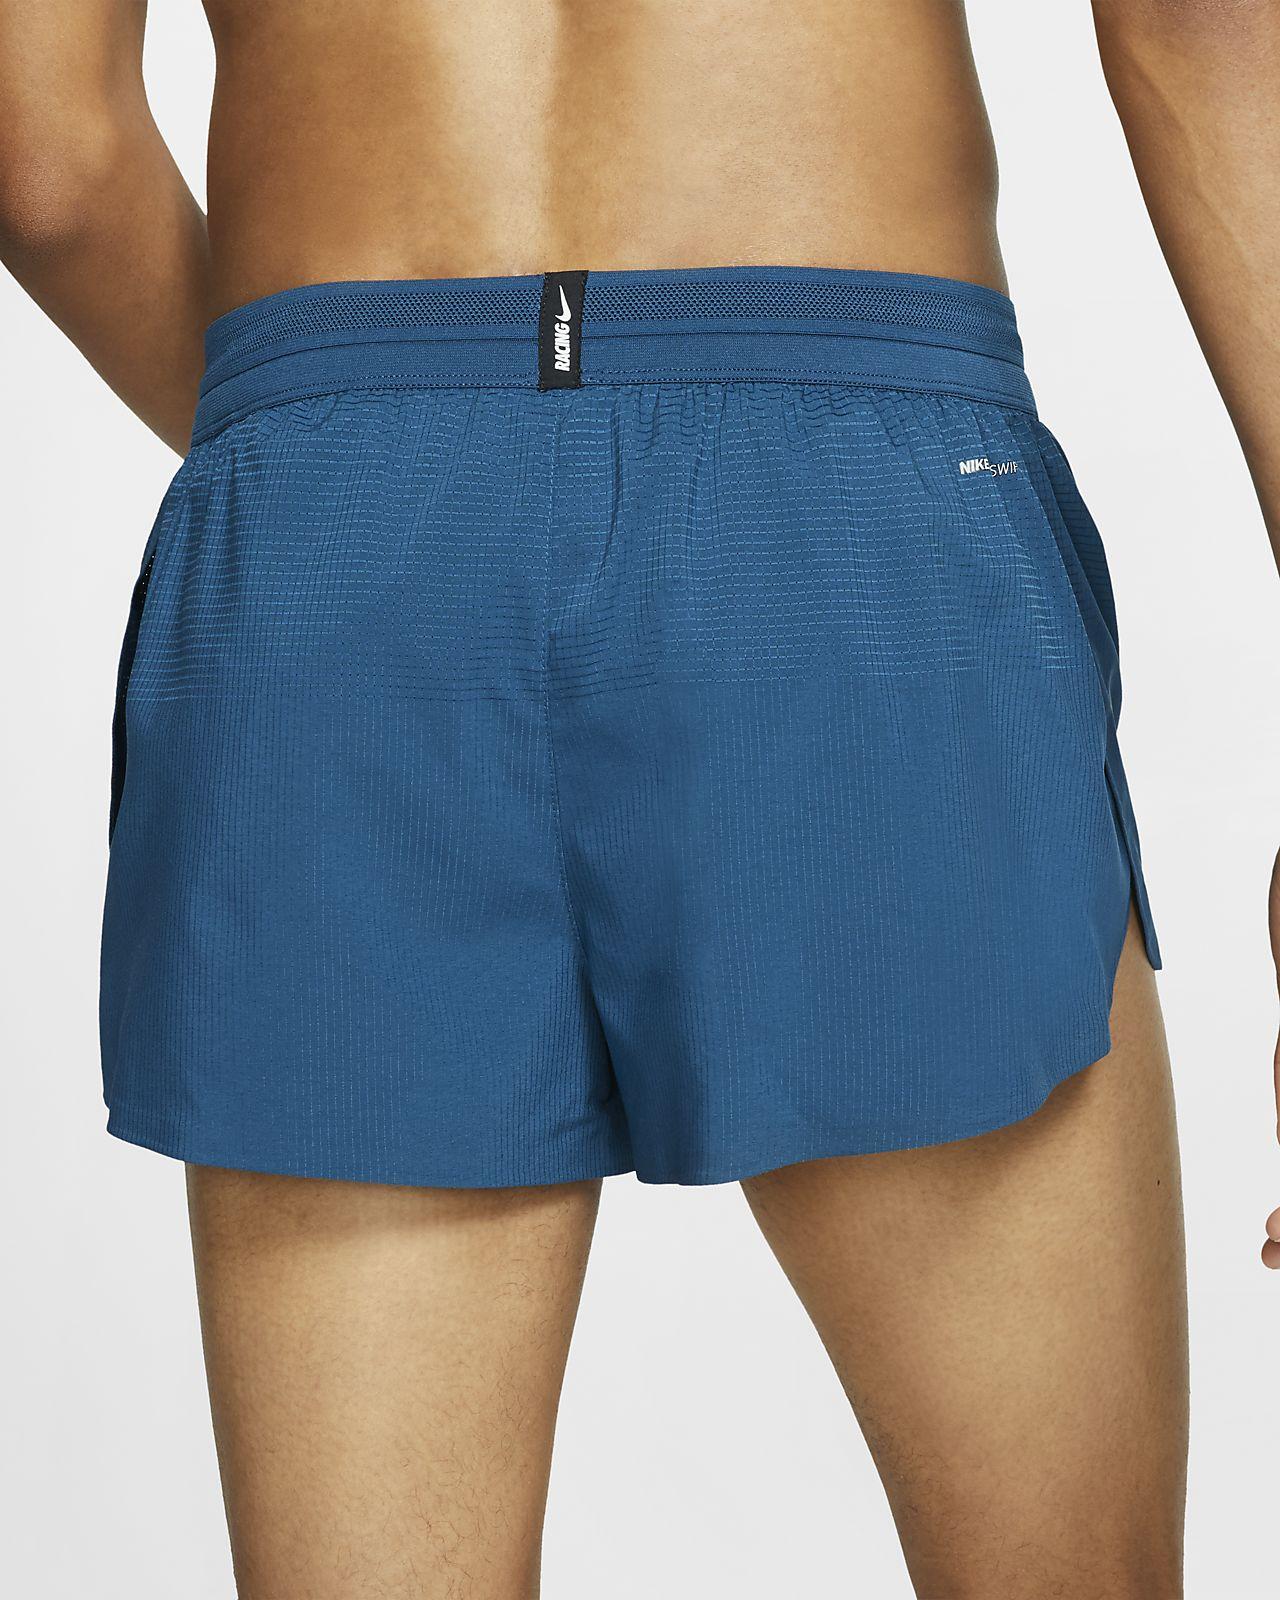 classic fit be62d 4aa51 ... Short de running Nike AeroSwift (London) 5 cm pour Homme